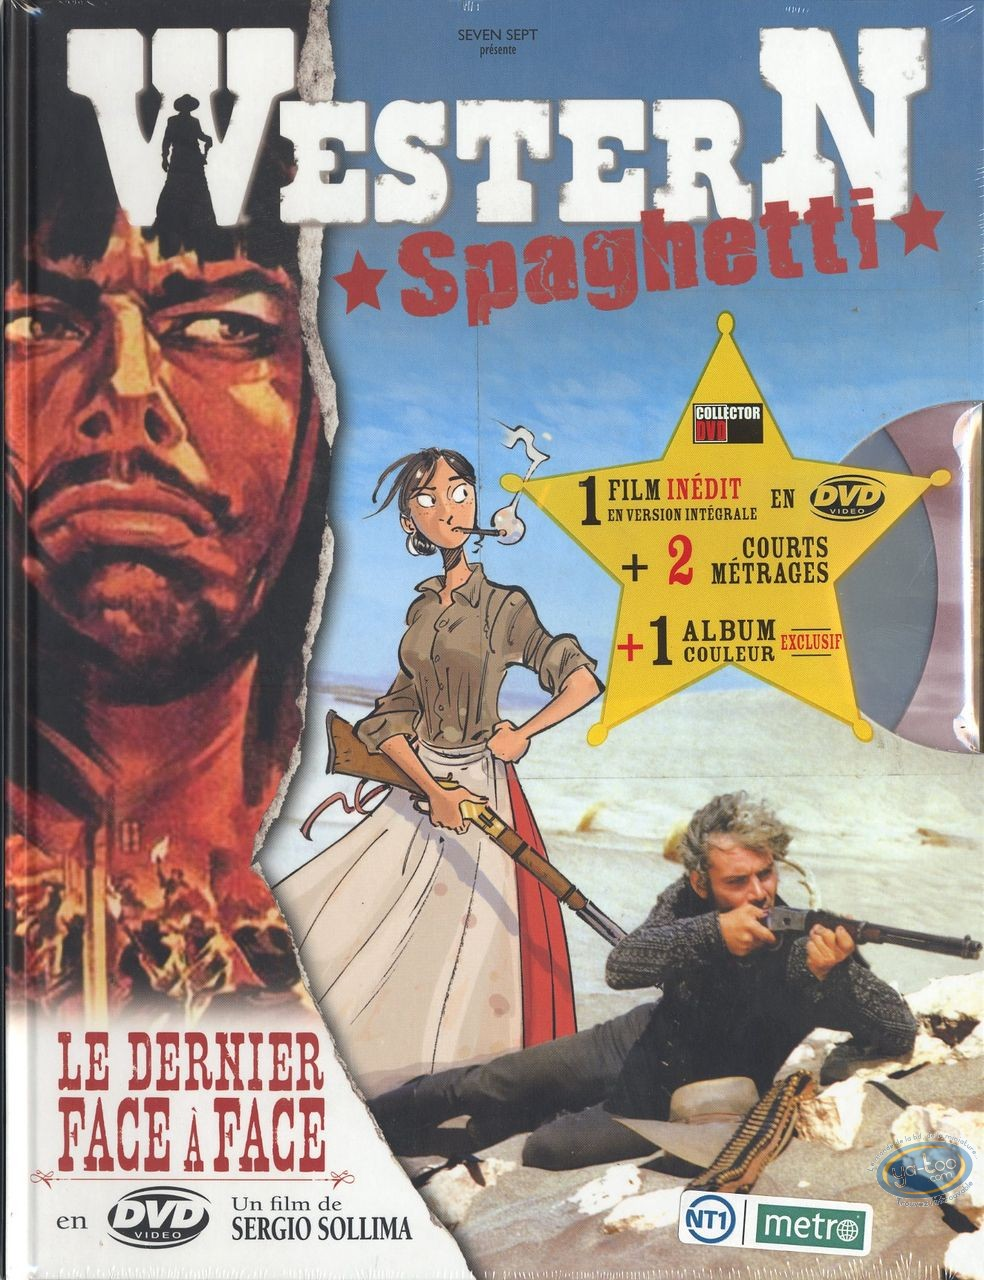 European Comic Books, Western Spaghetti : Western Spaghetti